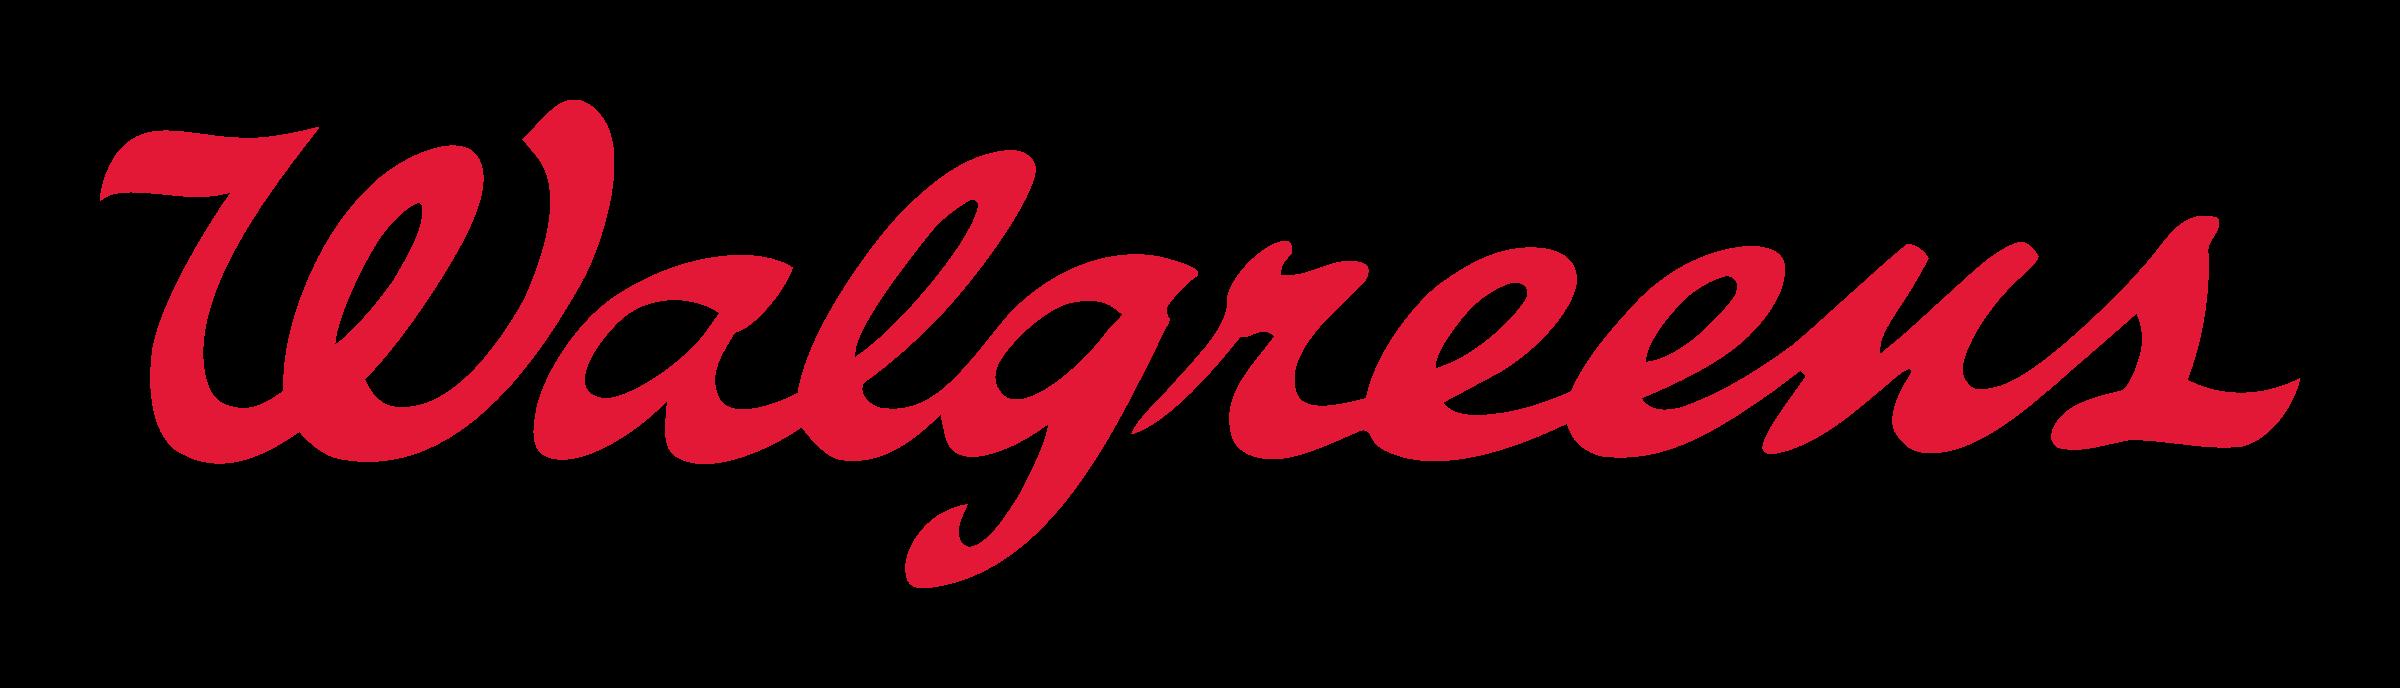 Walgreens Logo PNG Transparent & SVG Vector - Freebie Supply